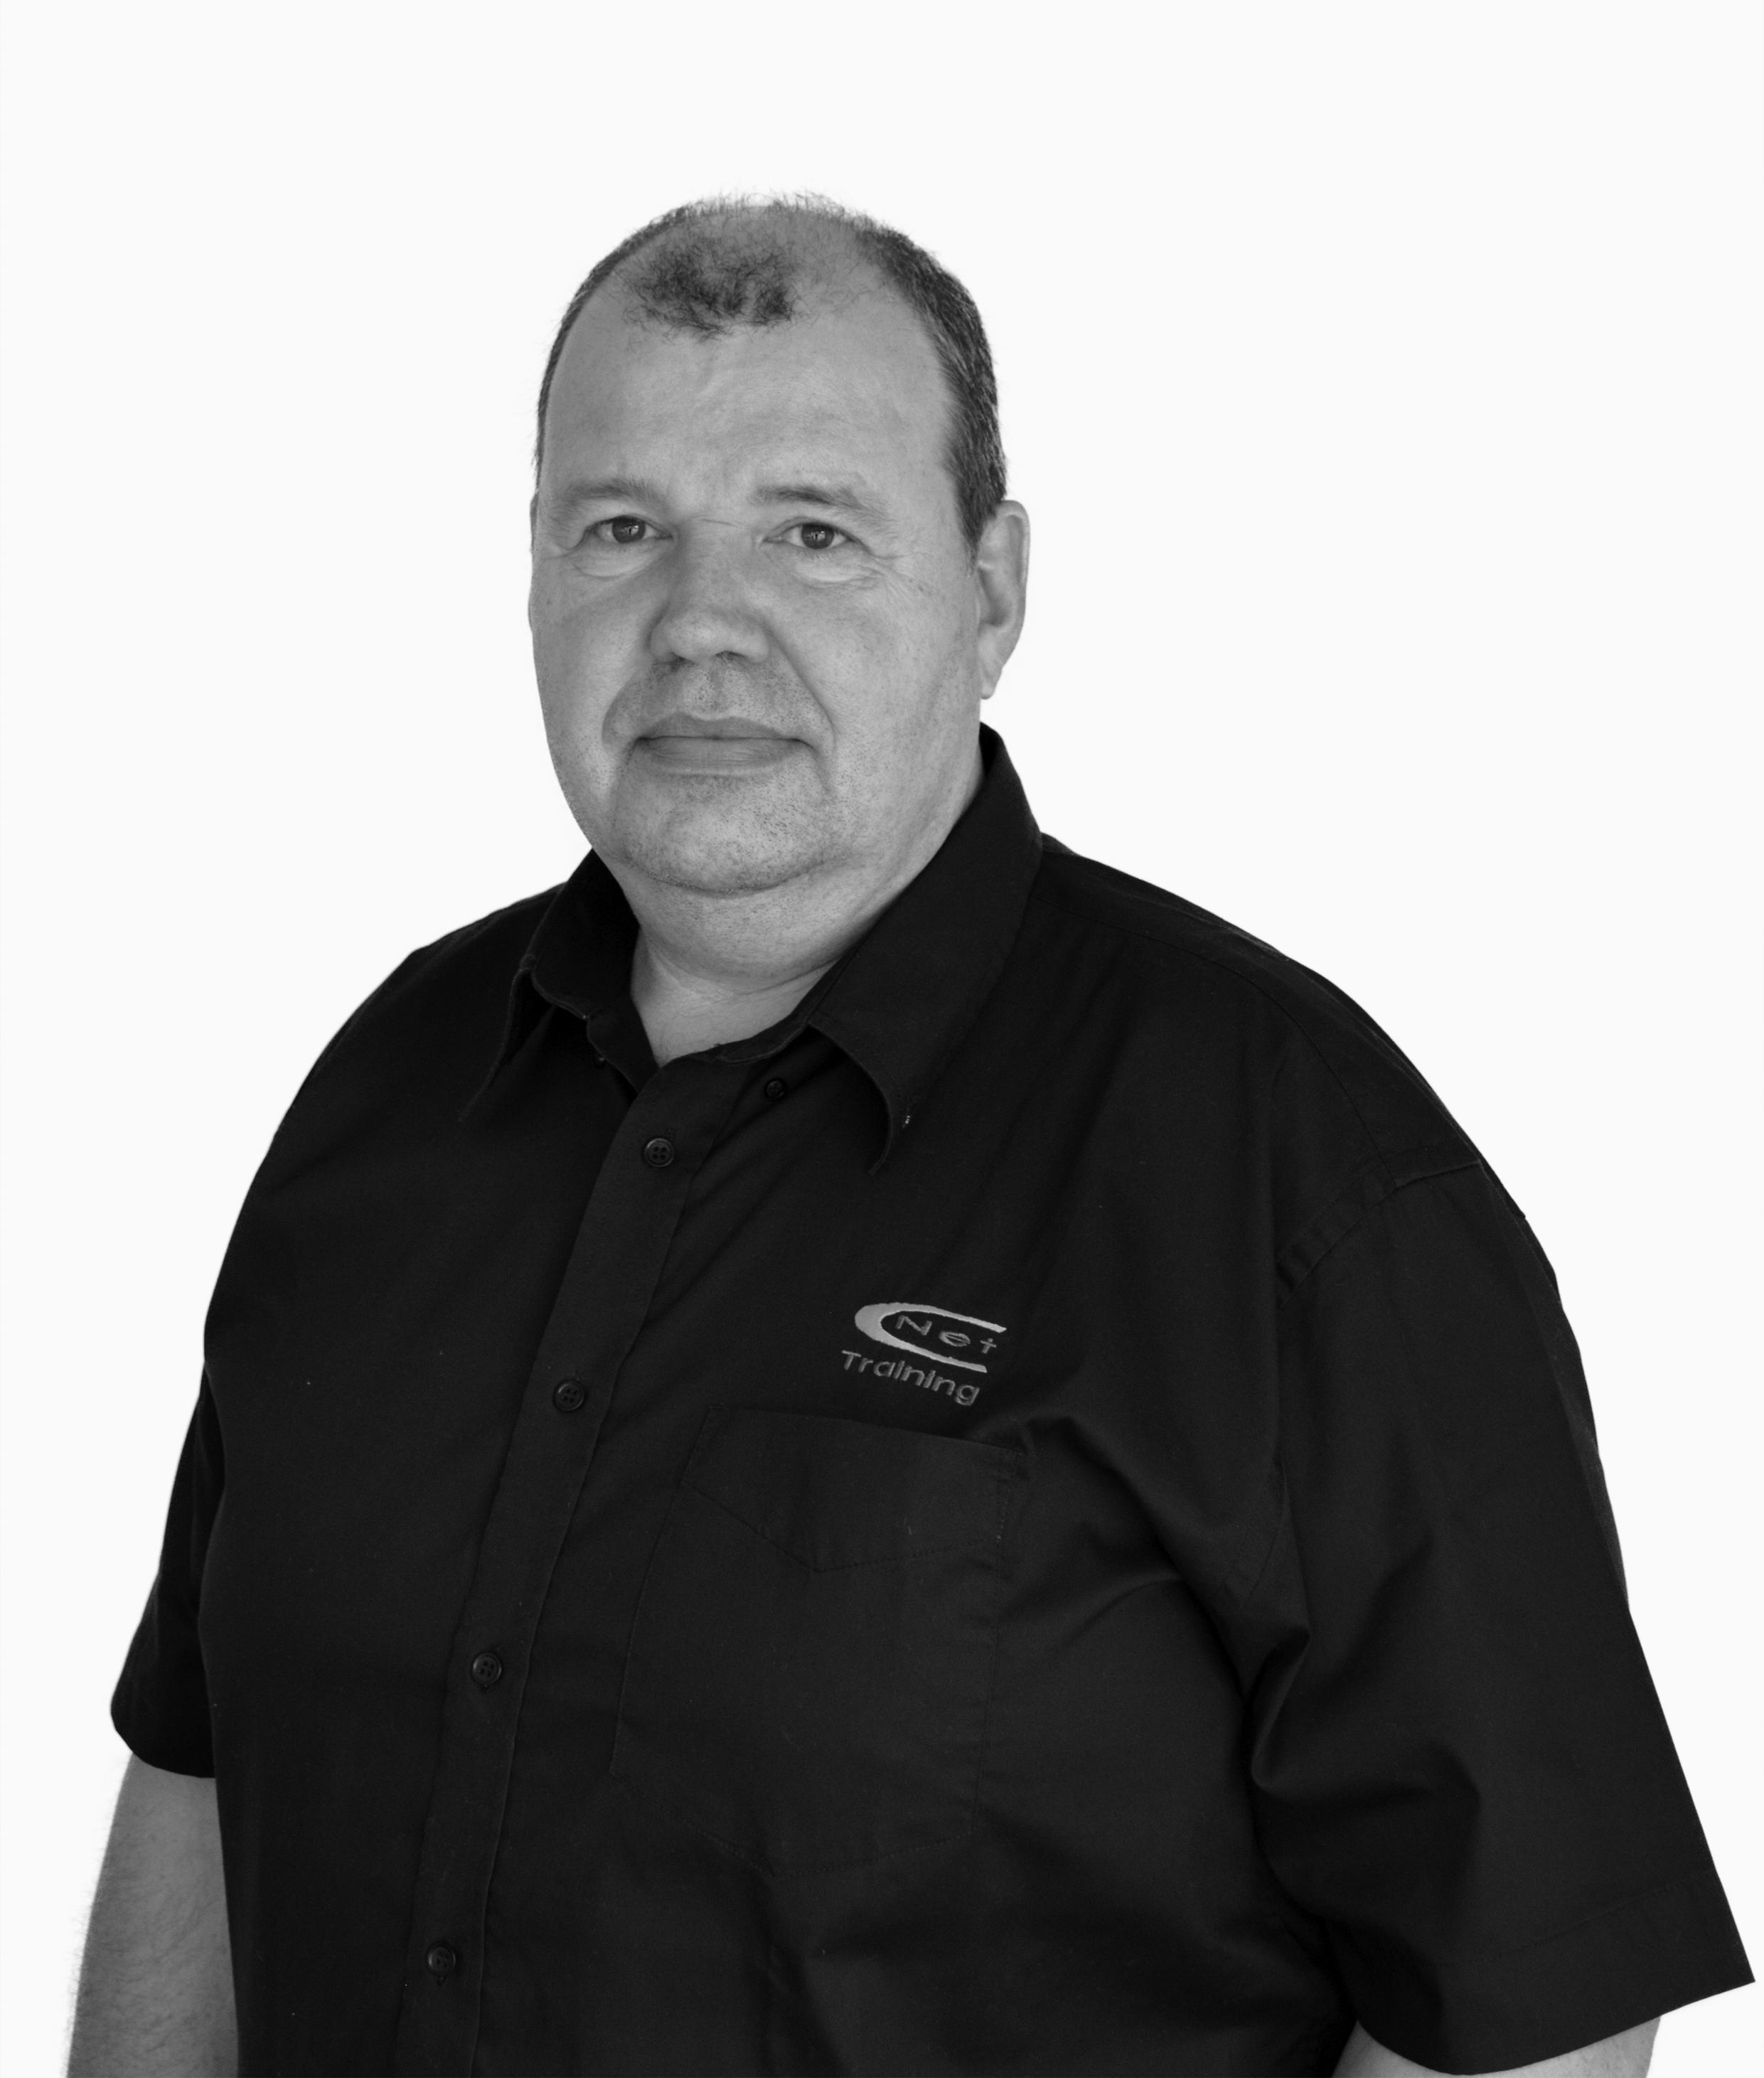 Kevin Lloyd-Bisley Instructor at CNet Training